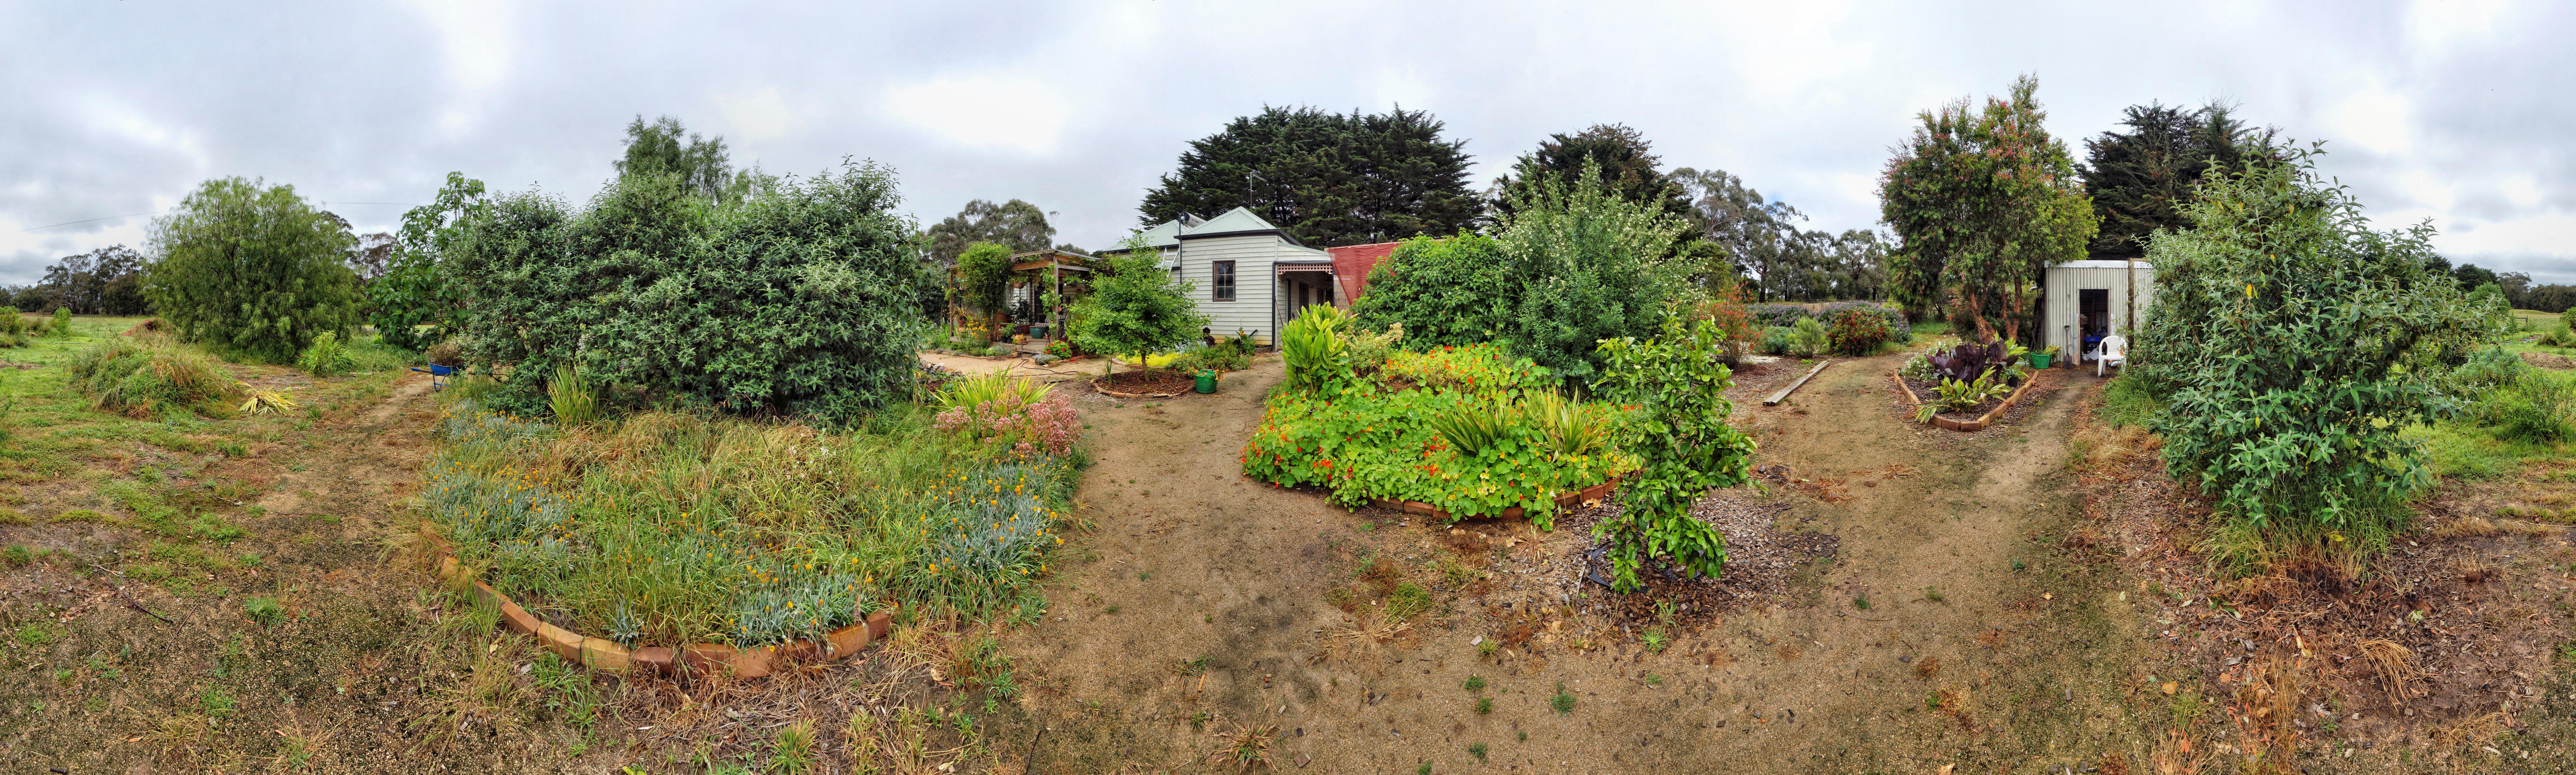 garden-path-ne-dup.jpeg